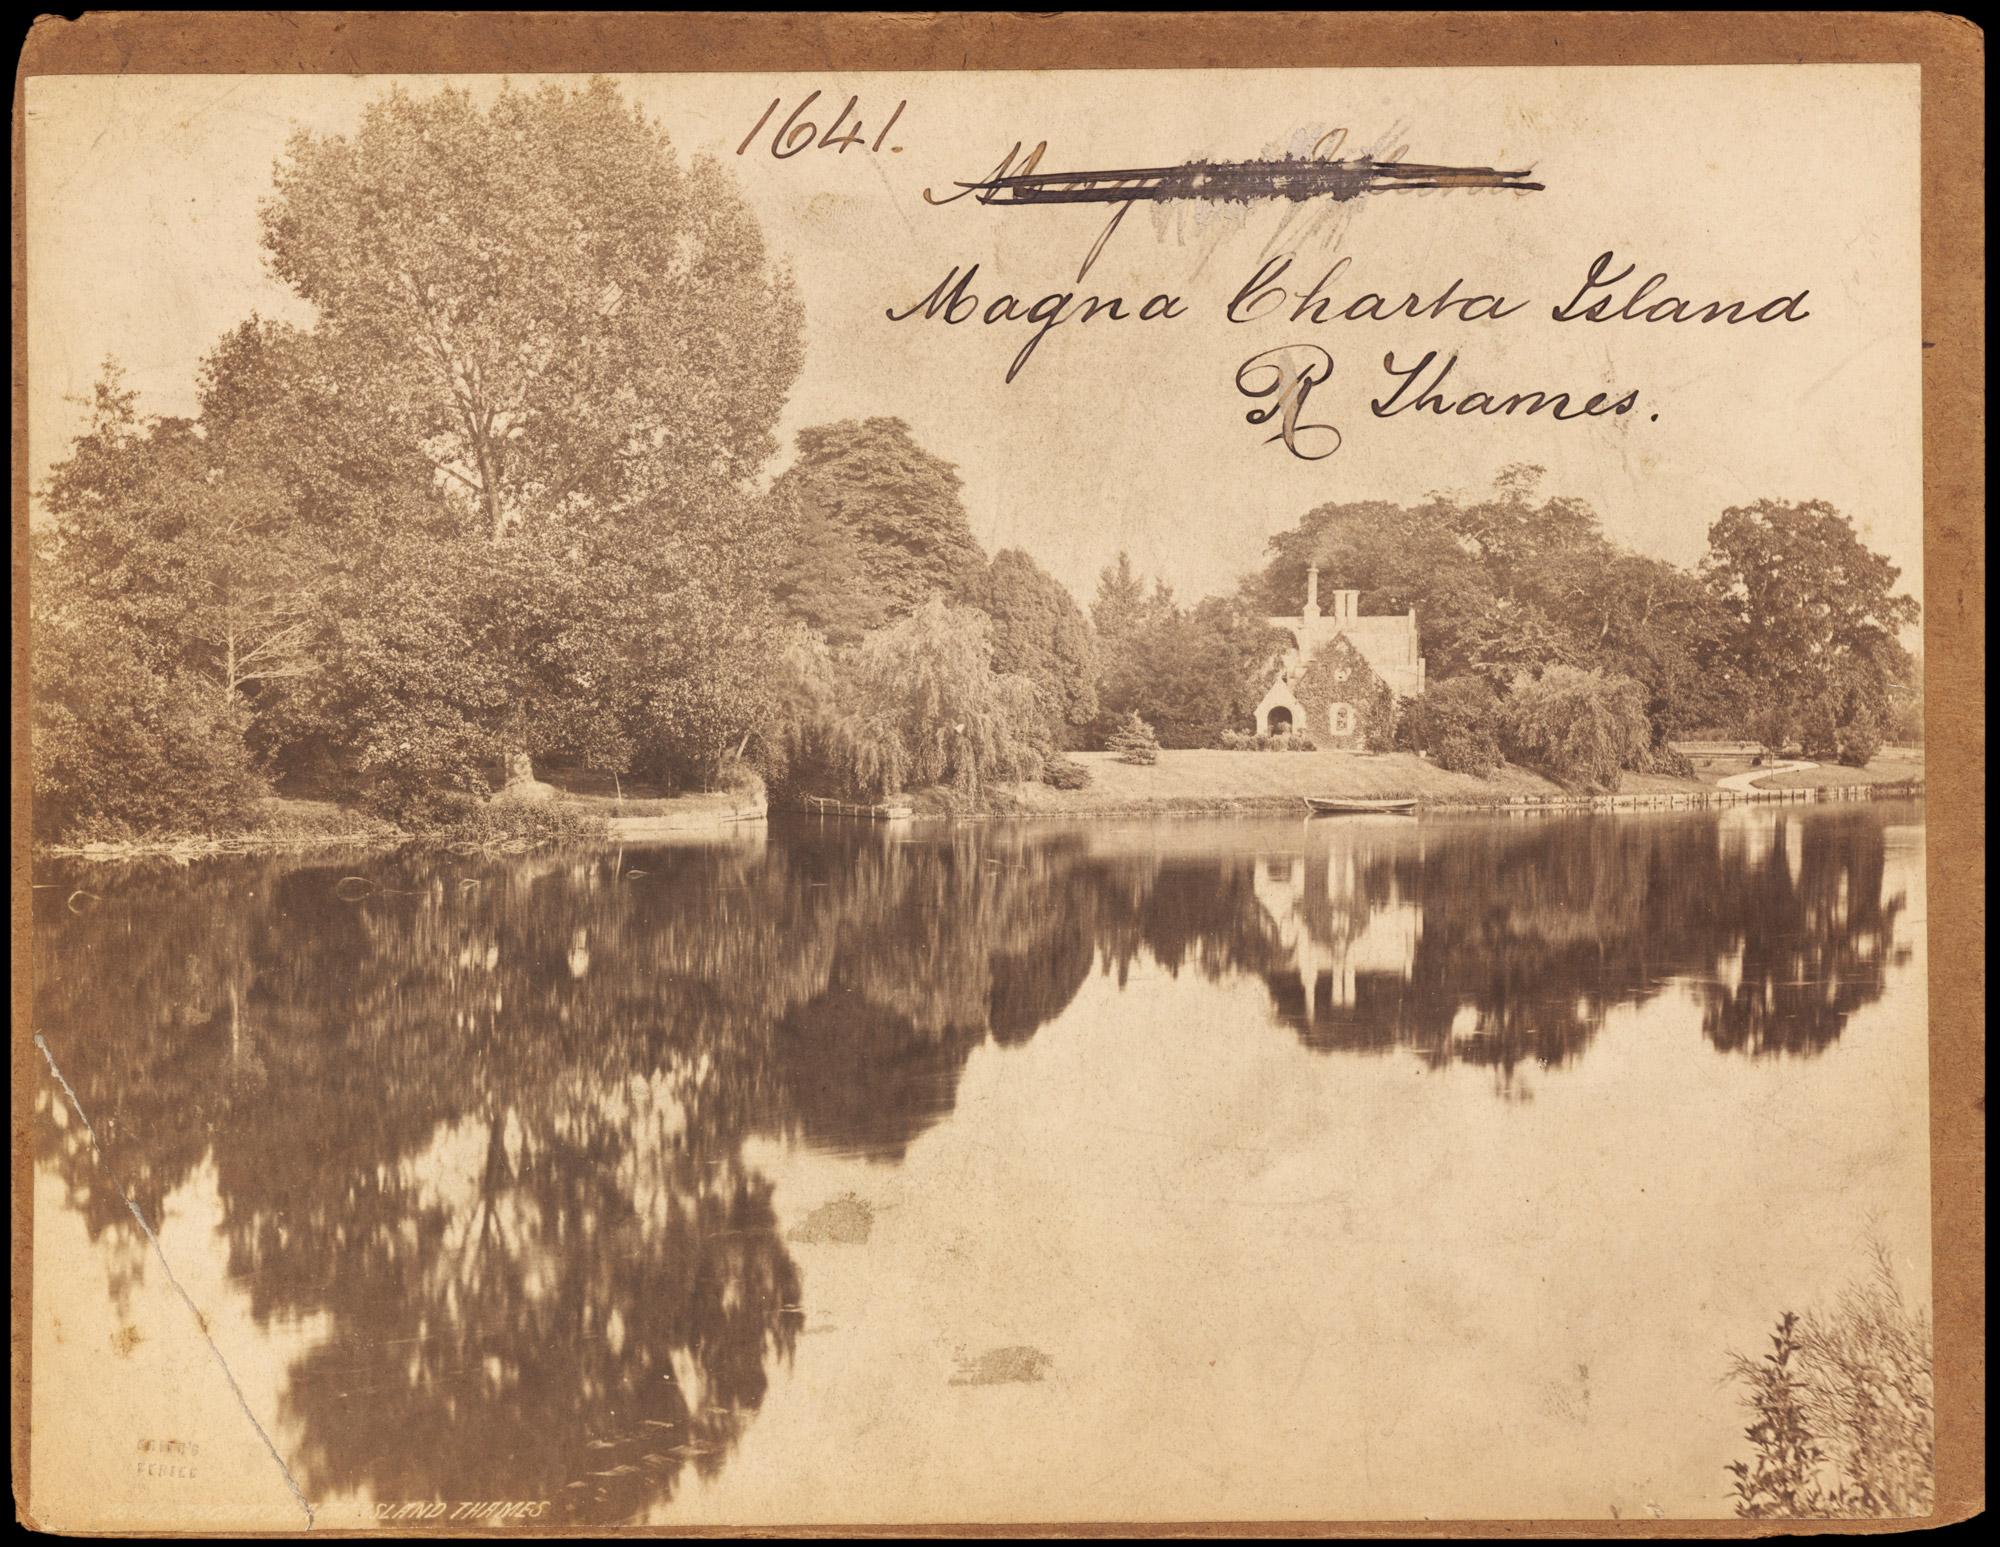 Photograph of Magna Charta Island